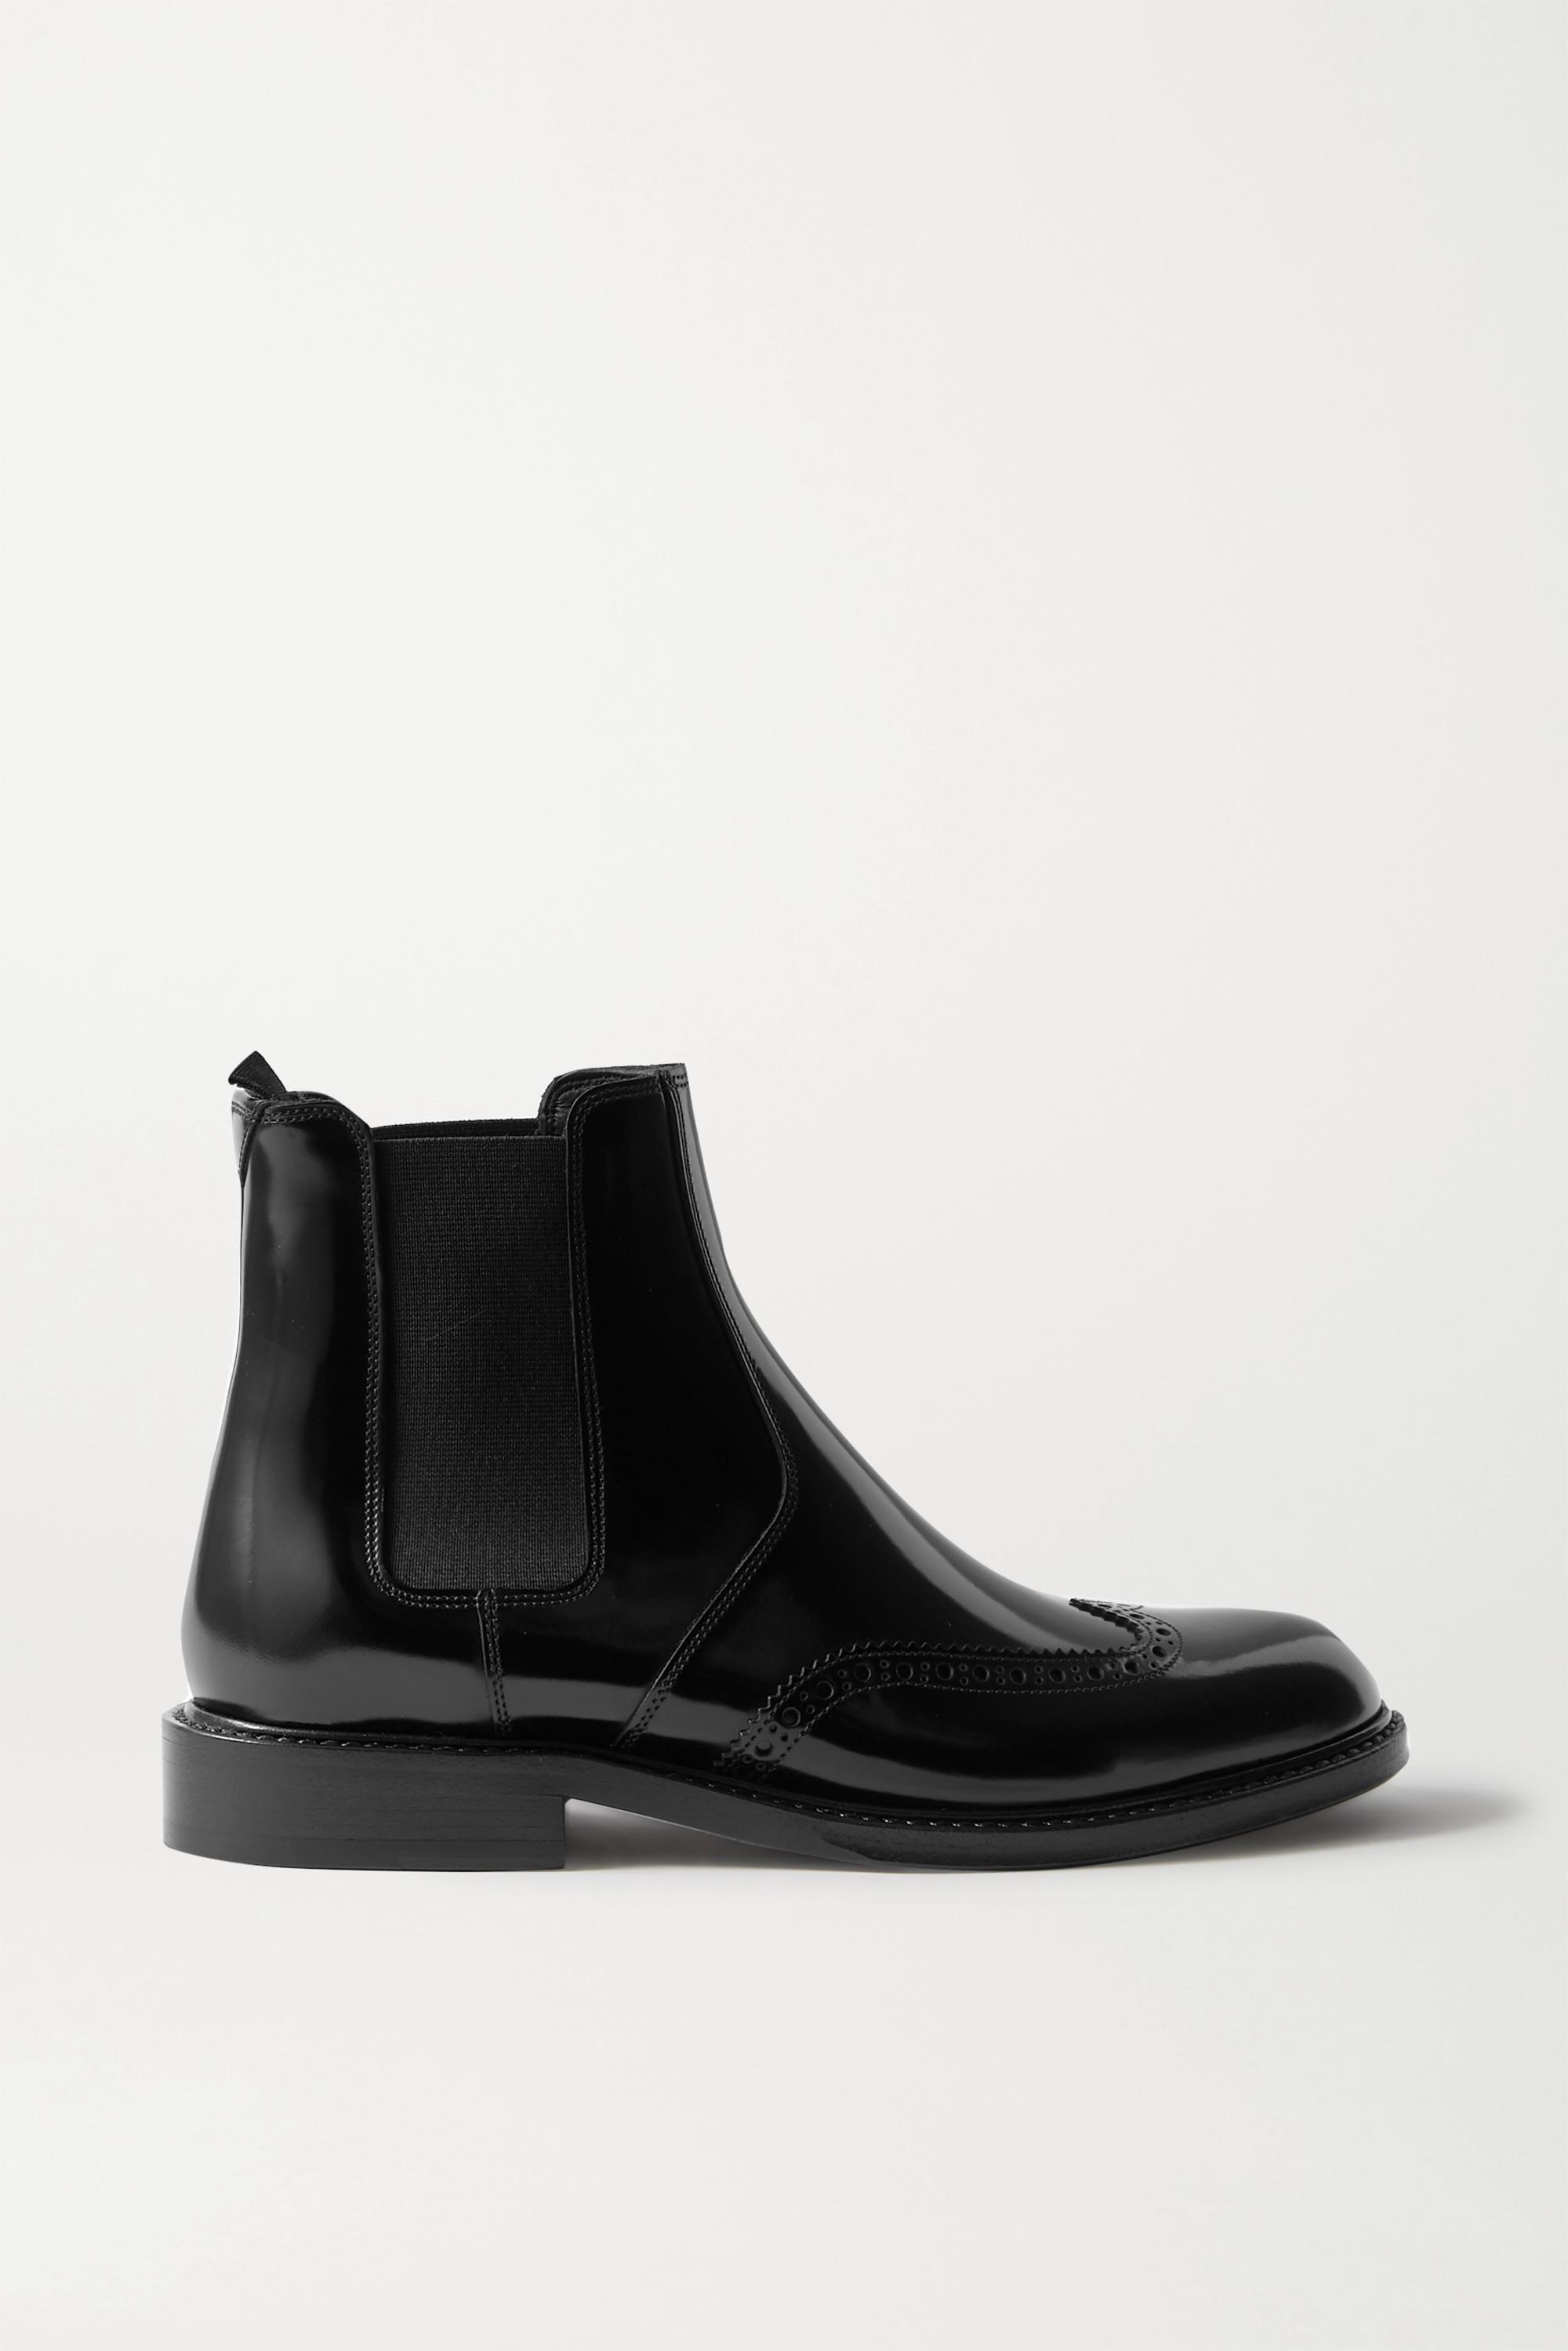 SAINT LAURENT Ceril glossed-leather Chelsea boots